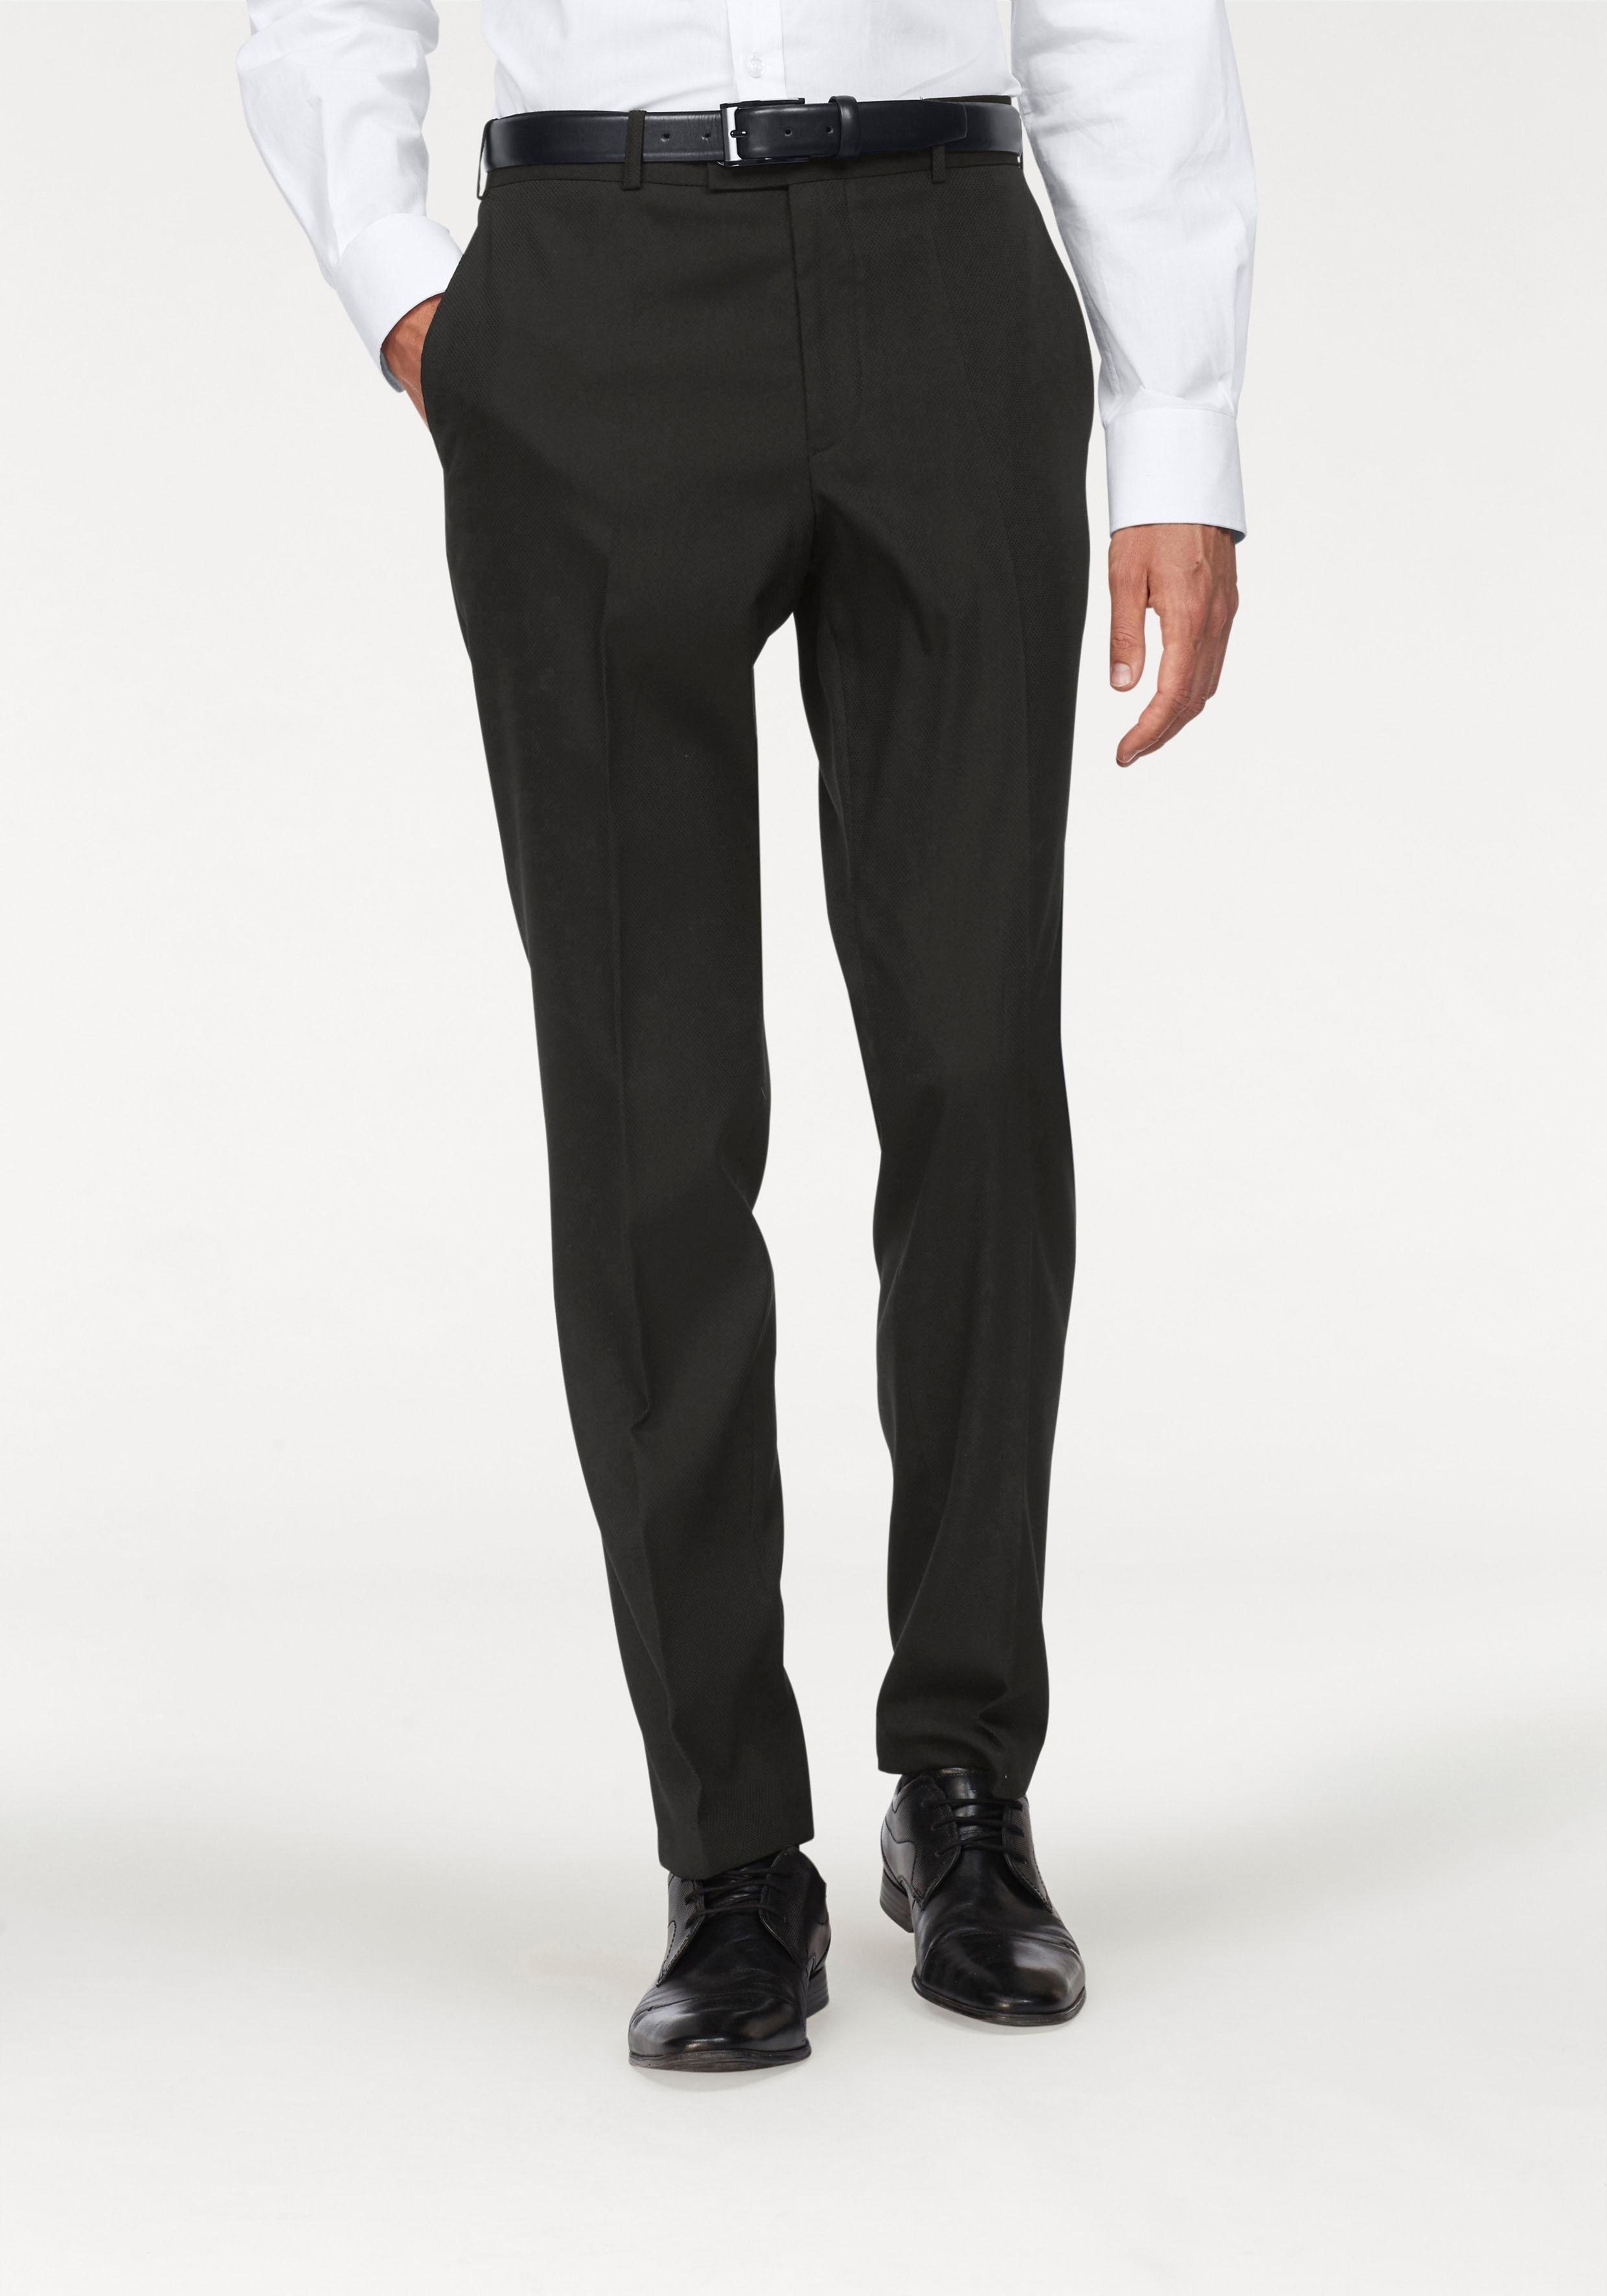 Goede Pantalon online kopen? Shop een pantalon hier | OTTO ZV-59